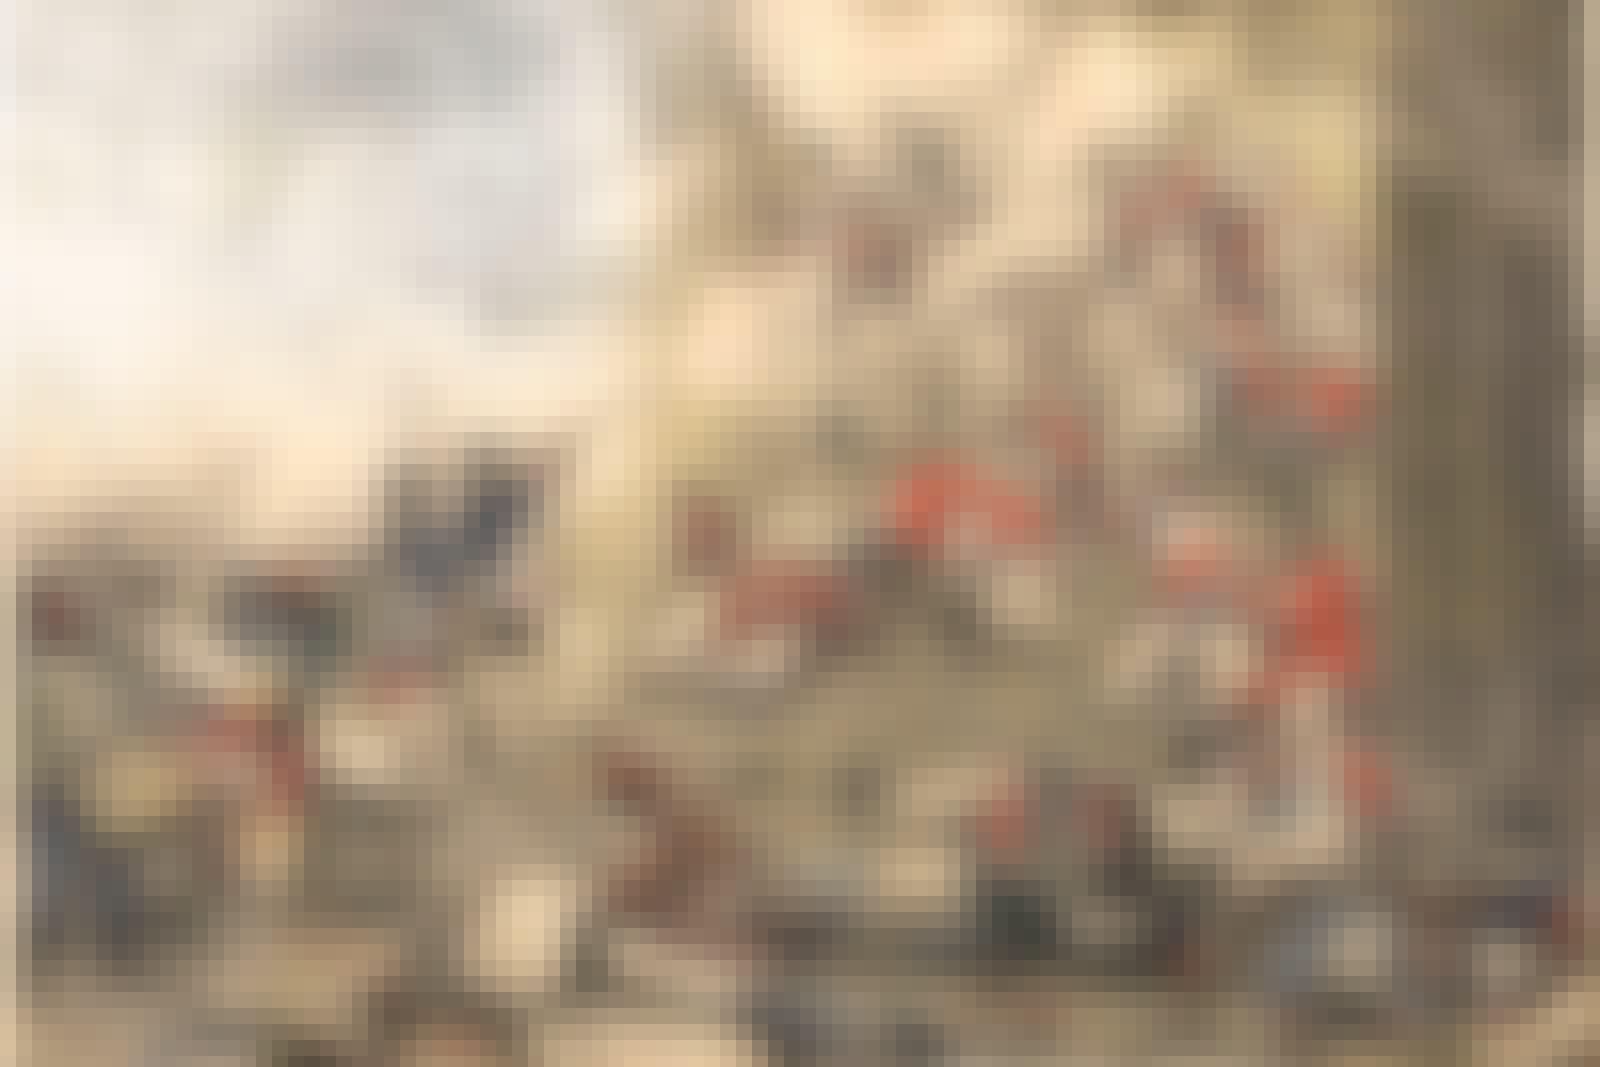 Schweizergarden blev massakreret, da pøblen stormede slottet Tuilerierne i Paris